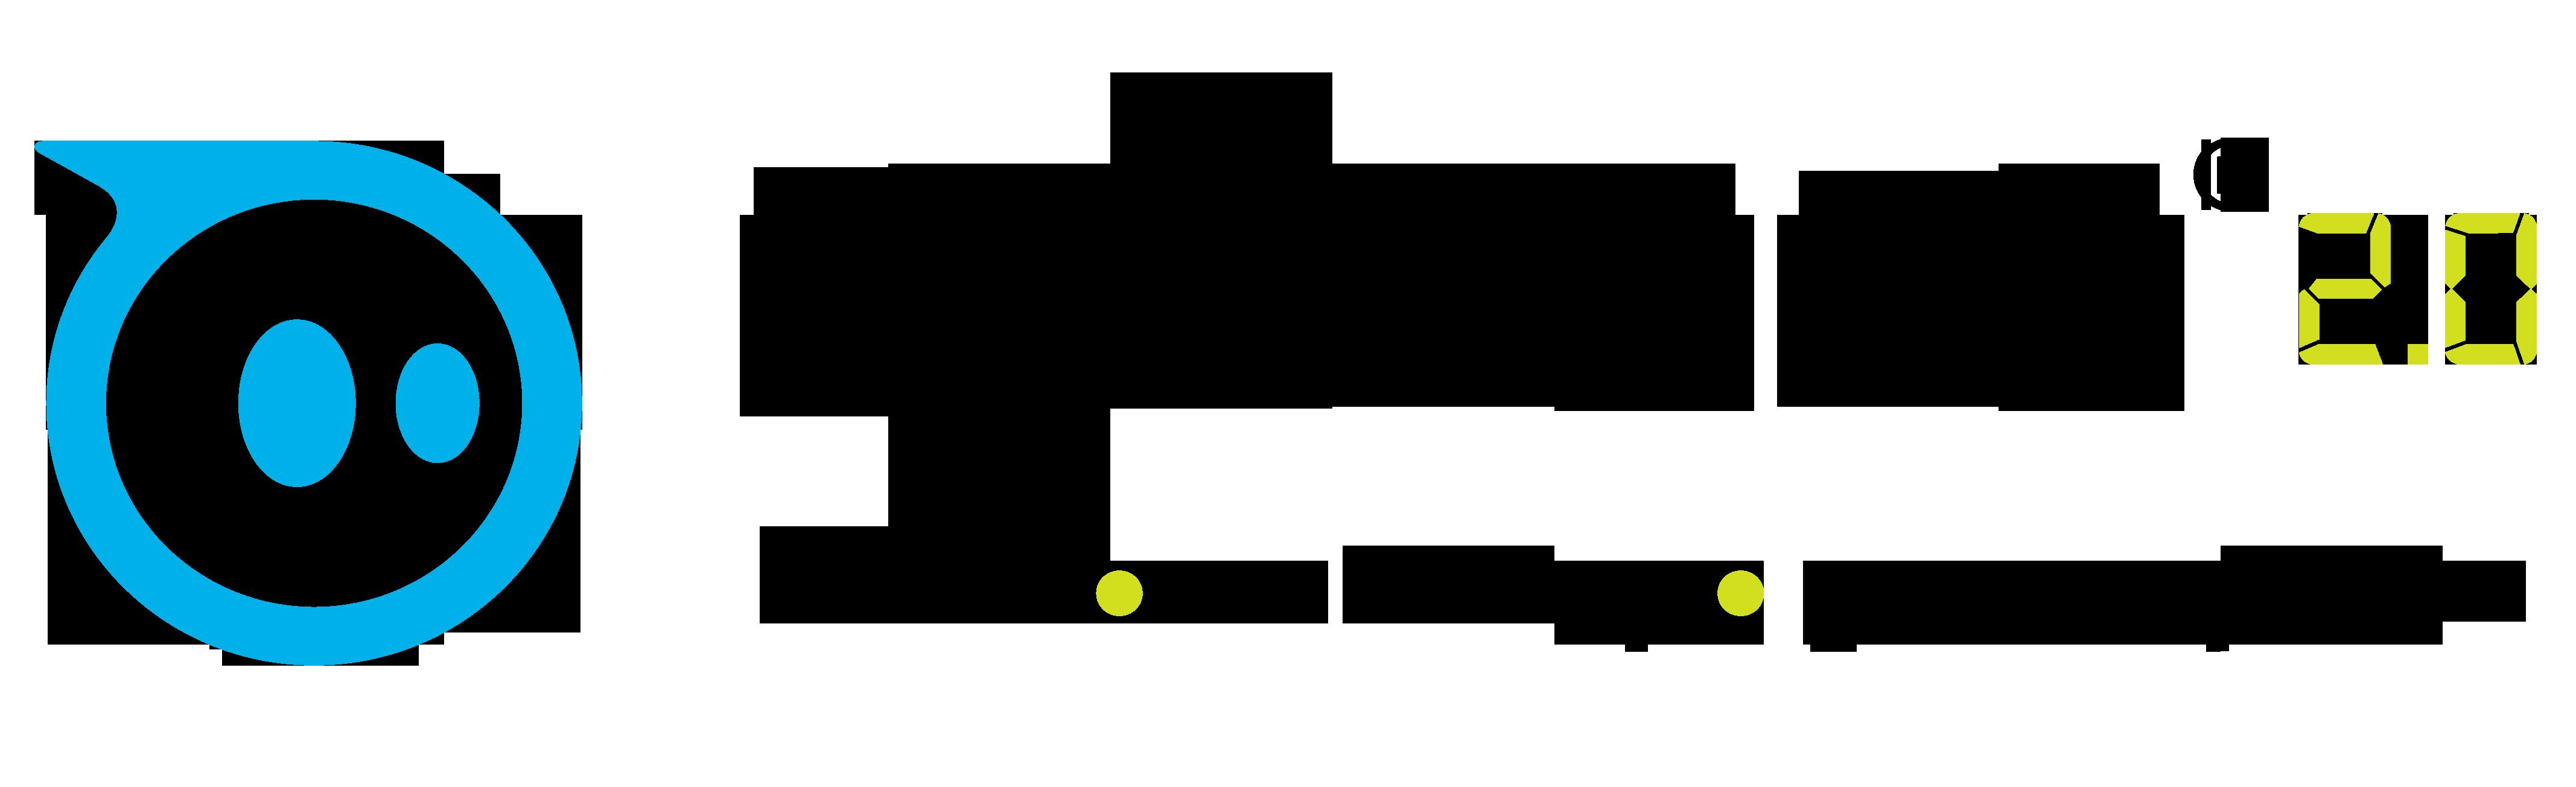 Sphero-2.0-Black_Transparent_Large